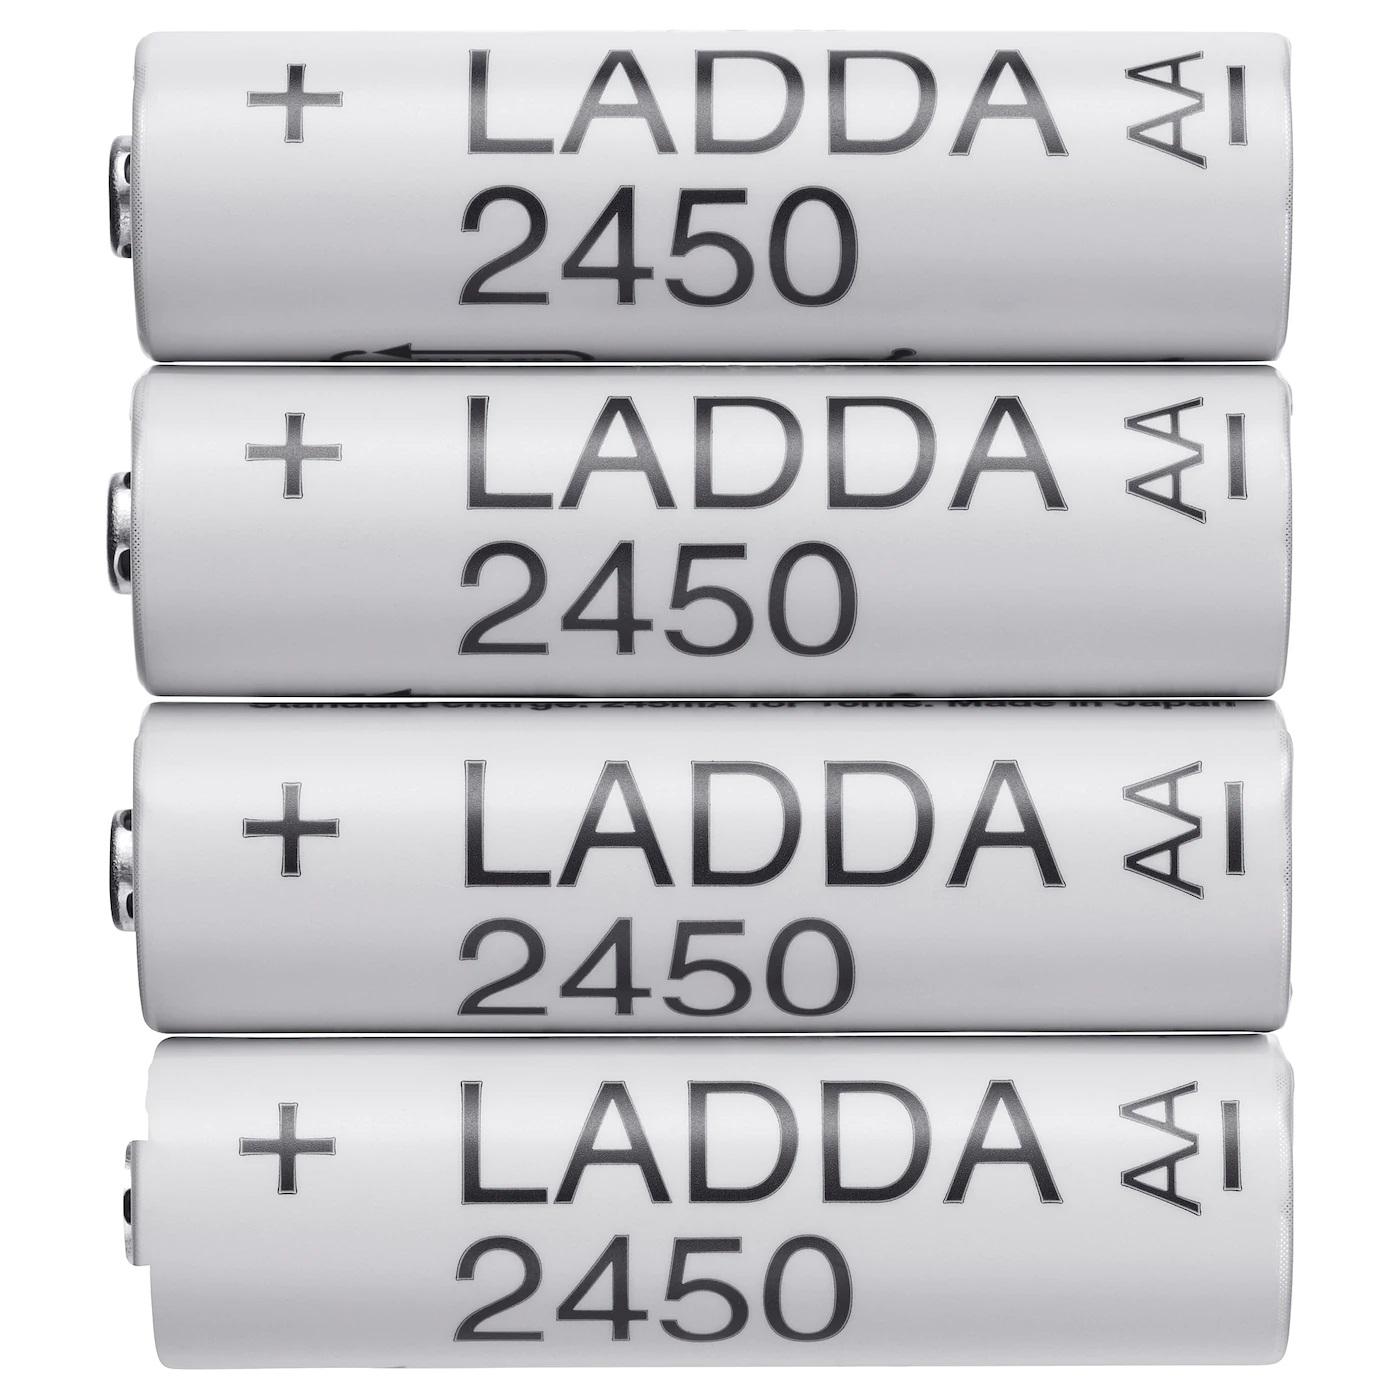 LADDA ( IKEA ) 2450mAh 8 sztuk przesyłka SMART Kod producenta 23076 Made in Japan AA HR6 R6 - ogniwa FDK jak Eneloop Pro